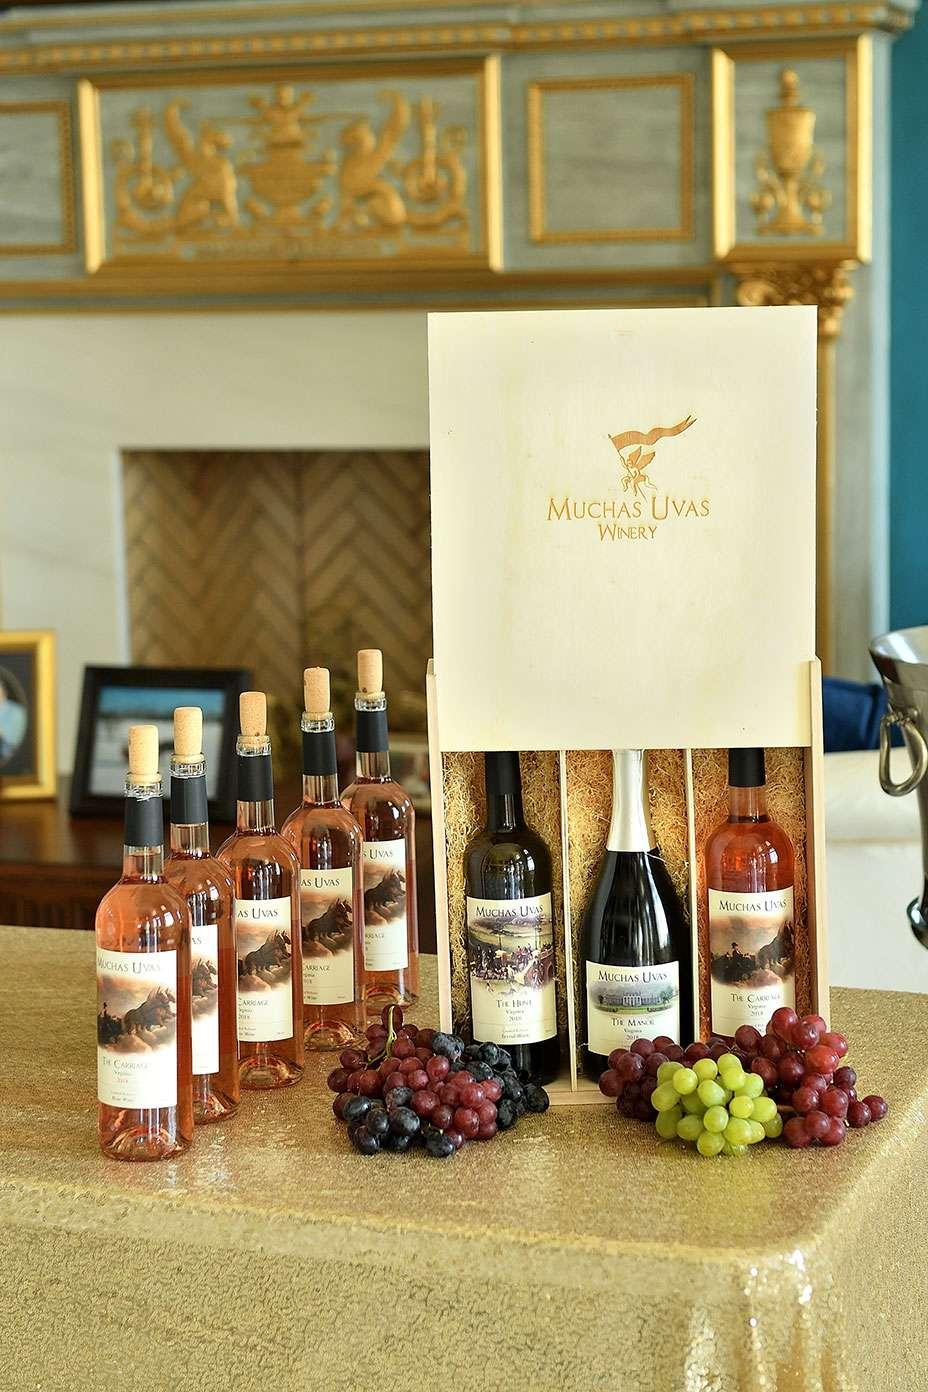 Muchas Uvas Winery - travel agency    Photo 7 of 10   Address: 116 High Meadow Manor LN, Flint Hill, VA 22627, USA   Phone: (202) 258-7095